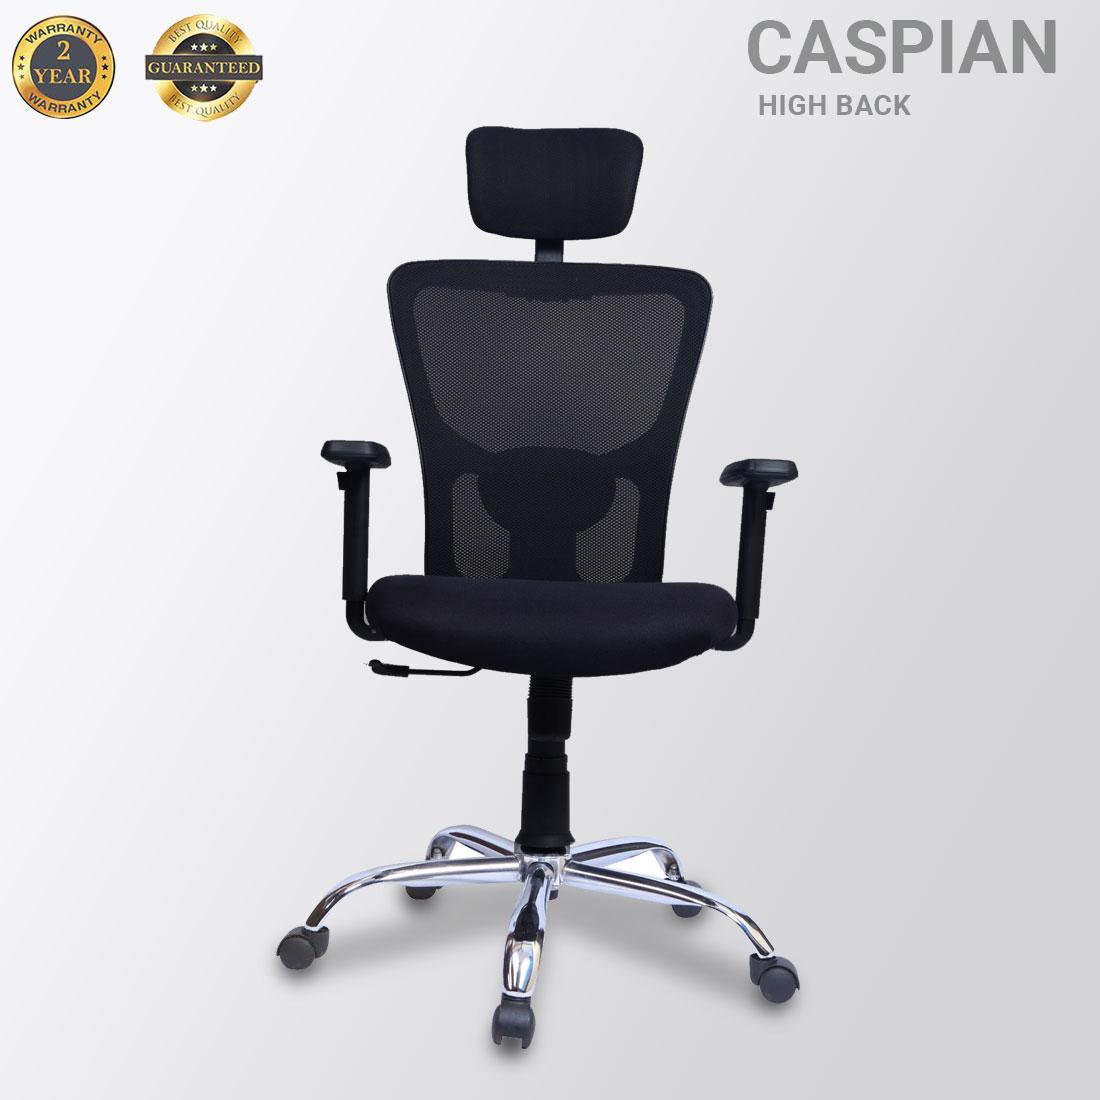 Caspian High Back Mesh